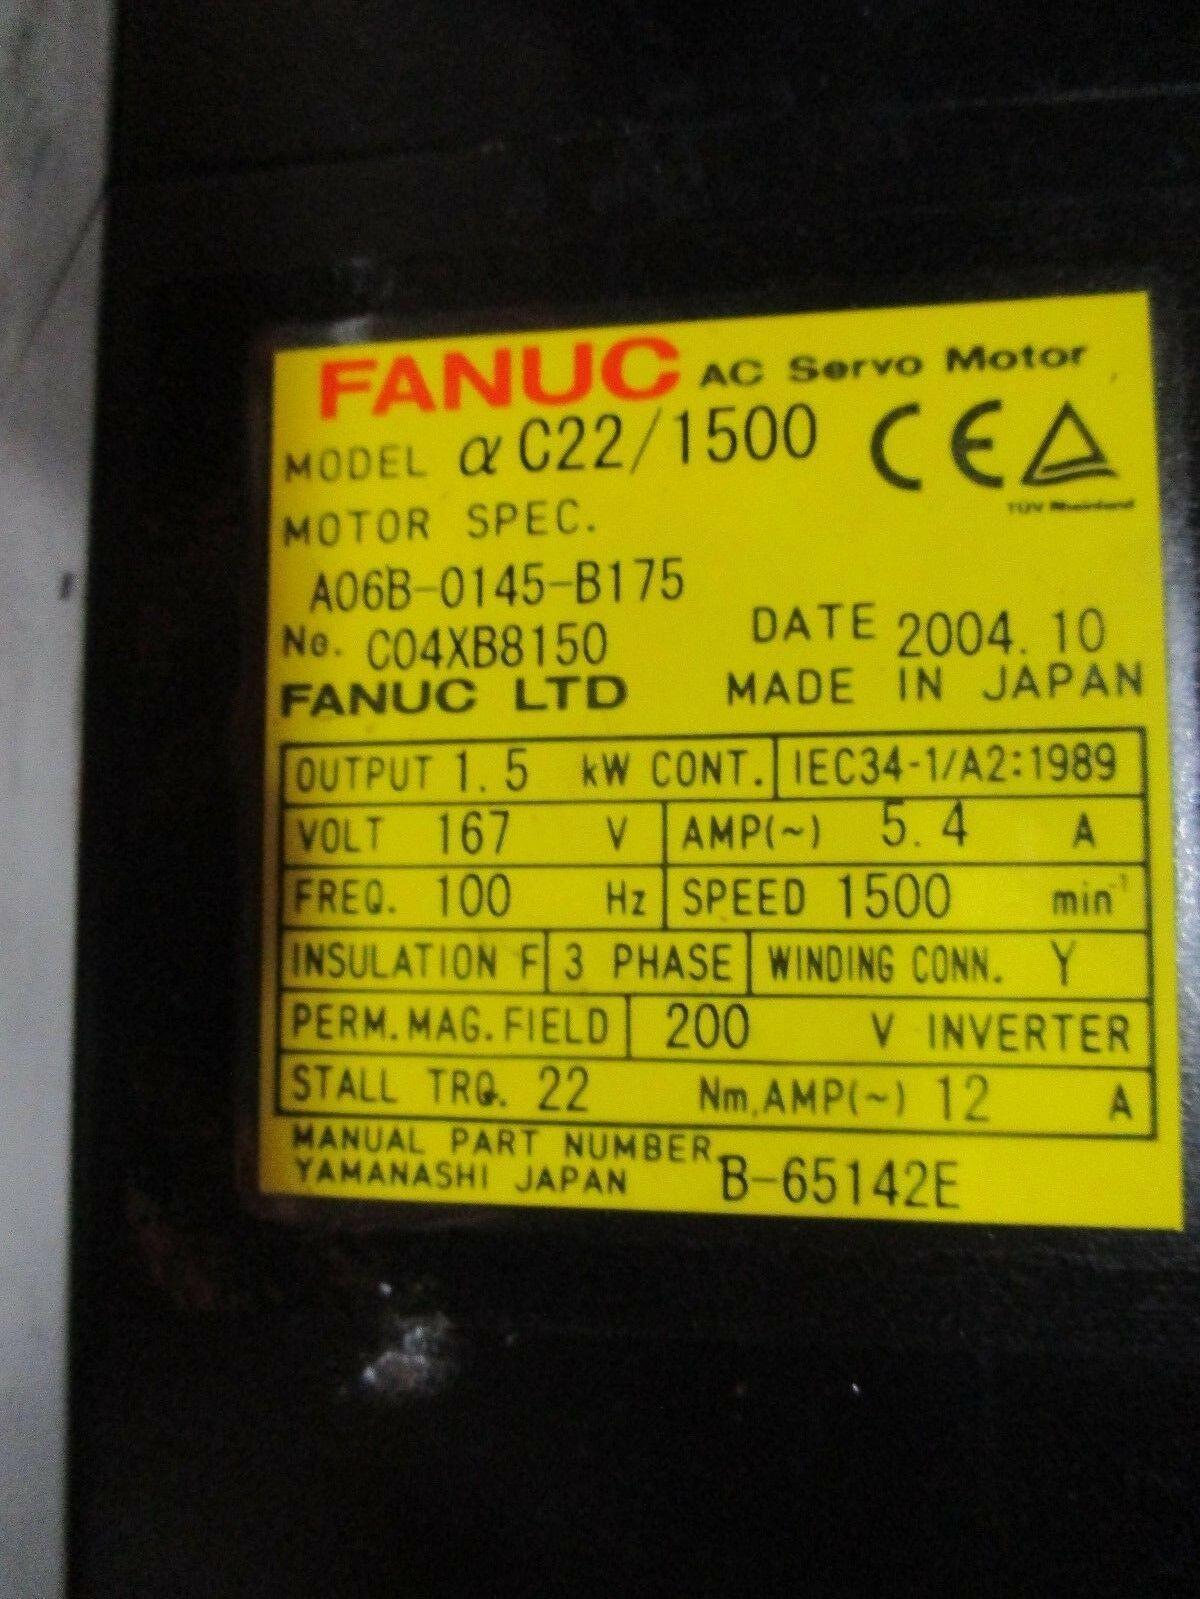 Fanuc Servo Motor Alpha C22/1500 A06B-0145-B175